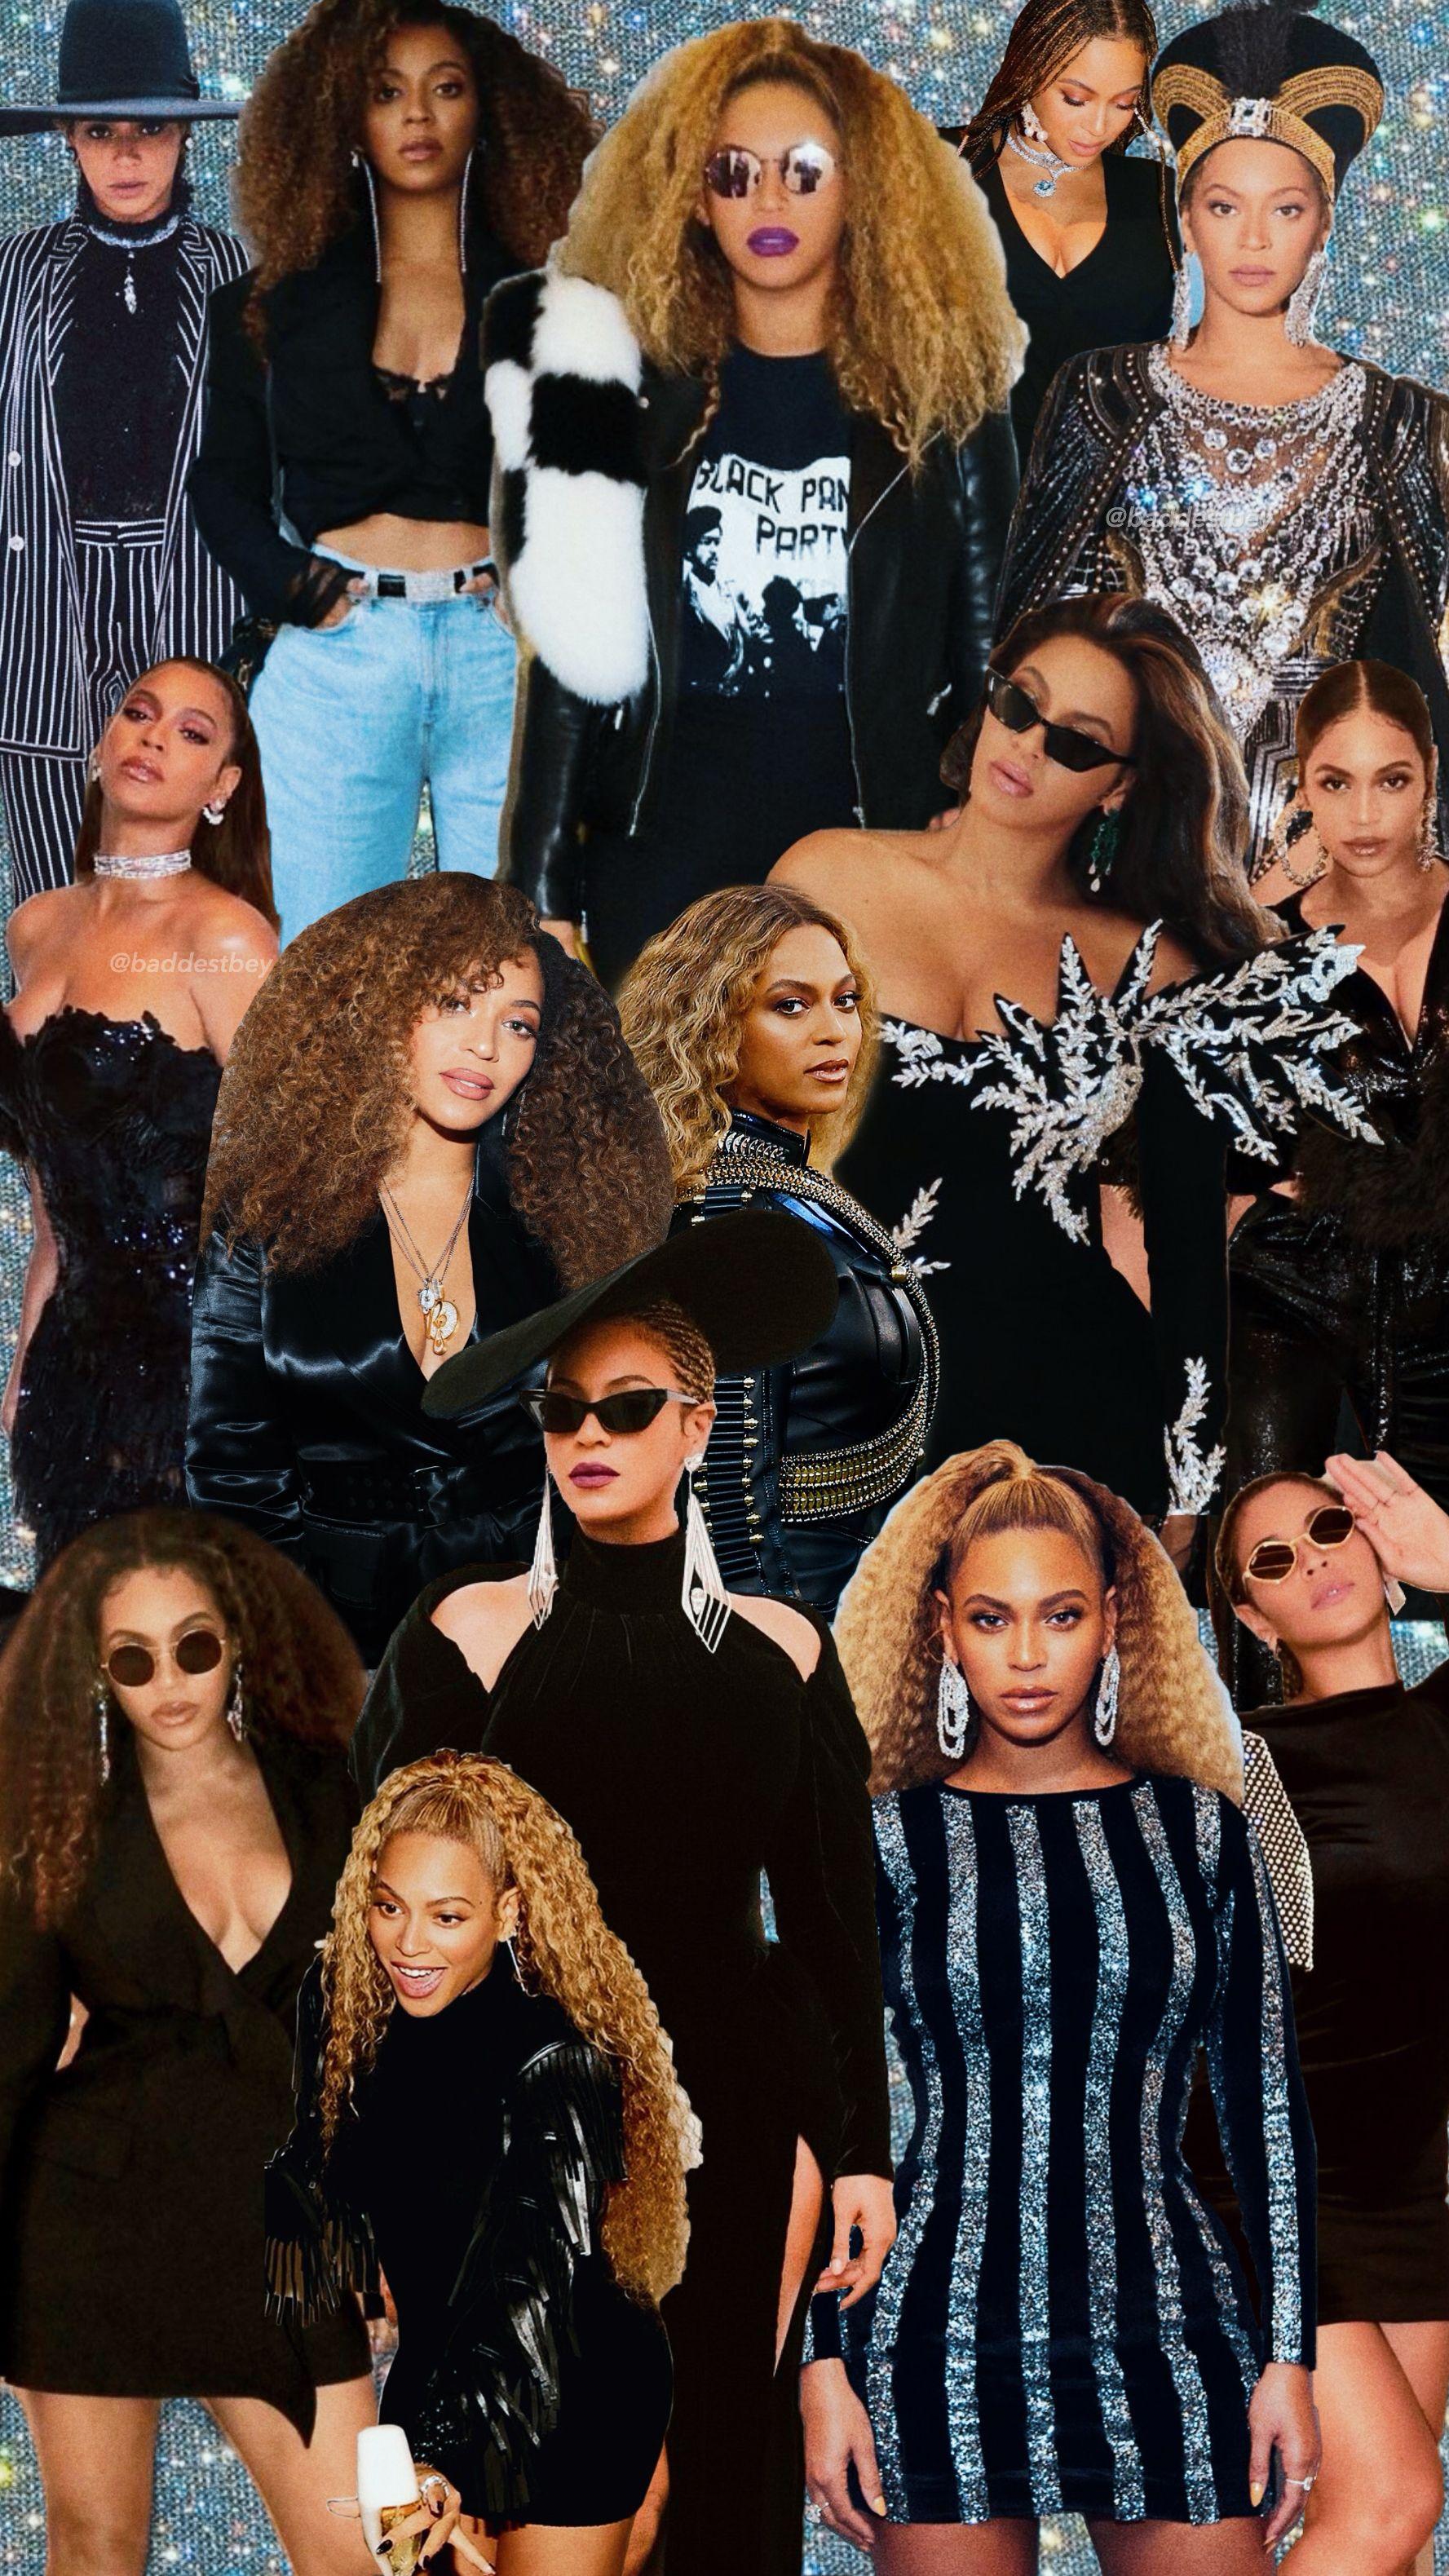 Beyonce Collage Beyonce Collage Wallpaper Queen Bee Beyonce Beyonce Queen Beyonce